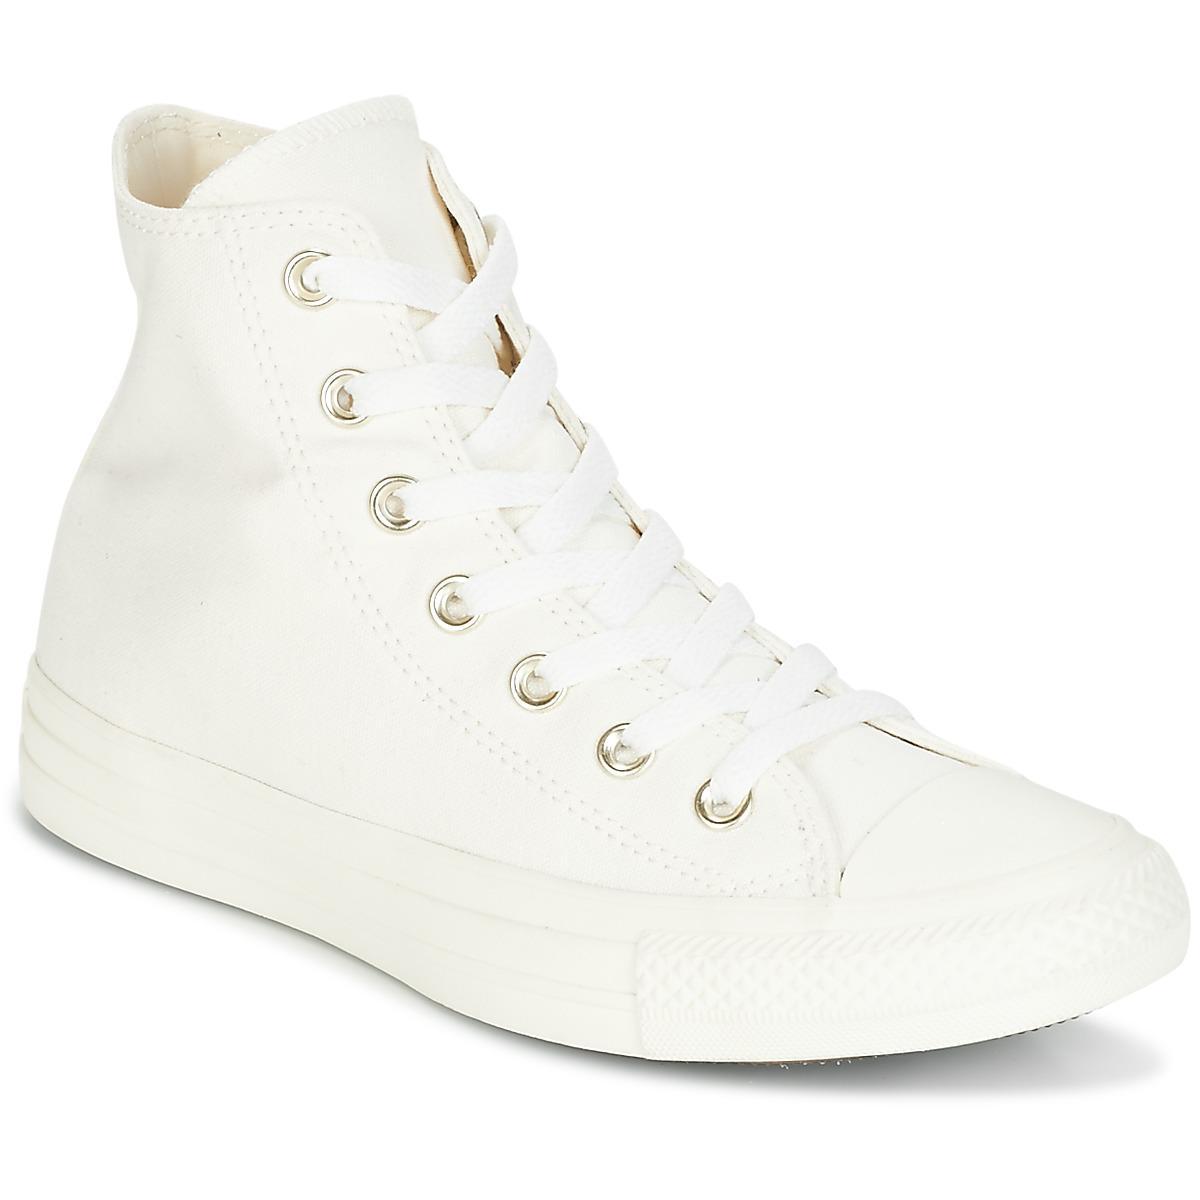 ca43988e4cea Converse - Natural Chuck Taylor All Star Hi Mono Glam Canvas Color Women s  Shoes (high. View fullscreen